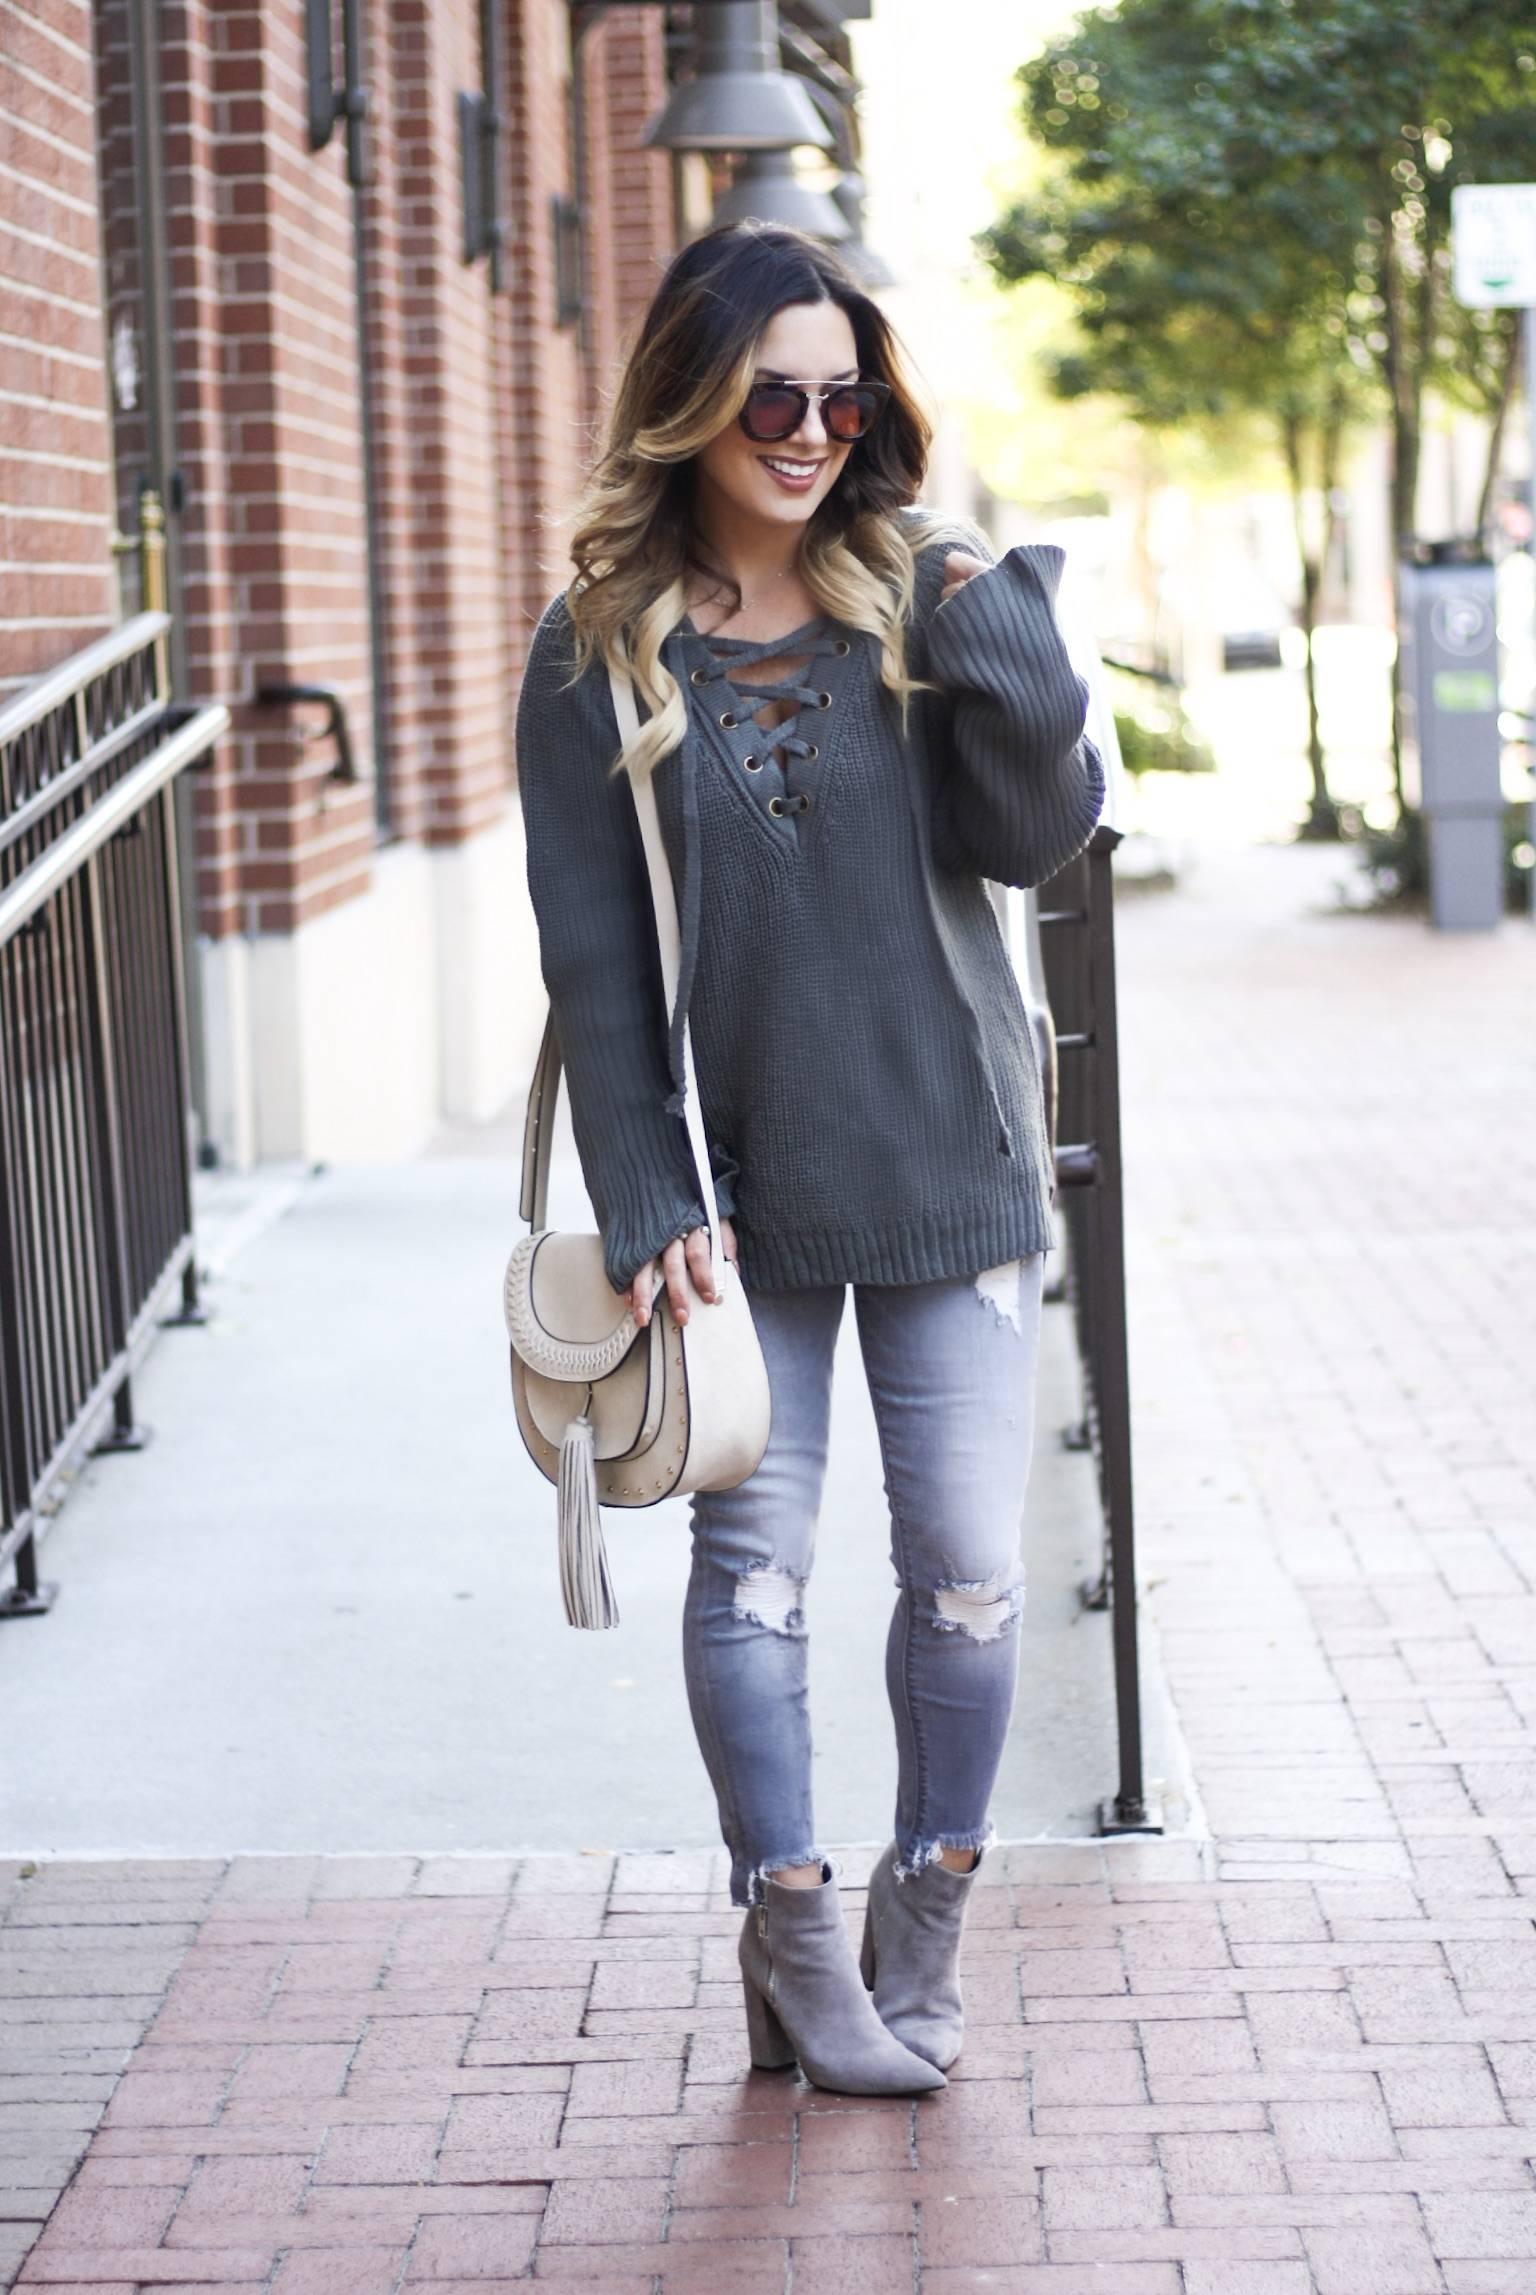 Oversized sweater and denim